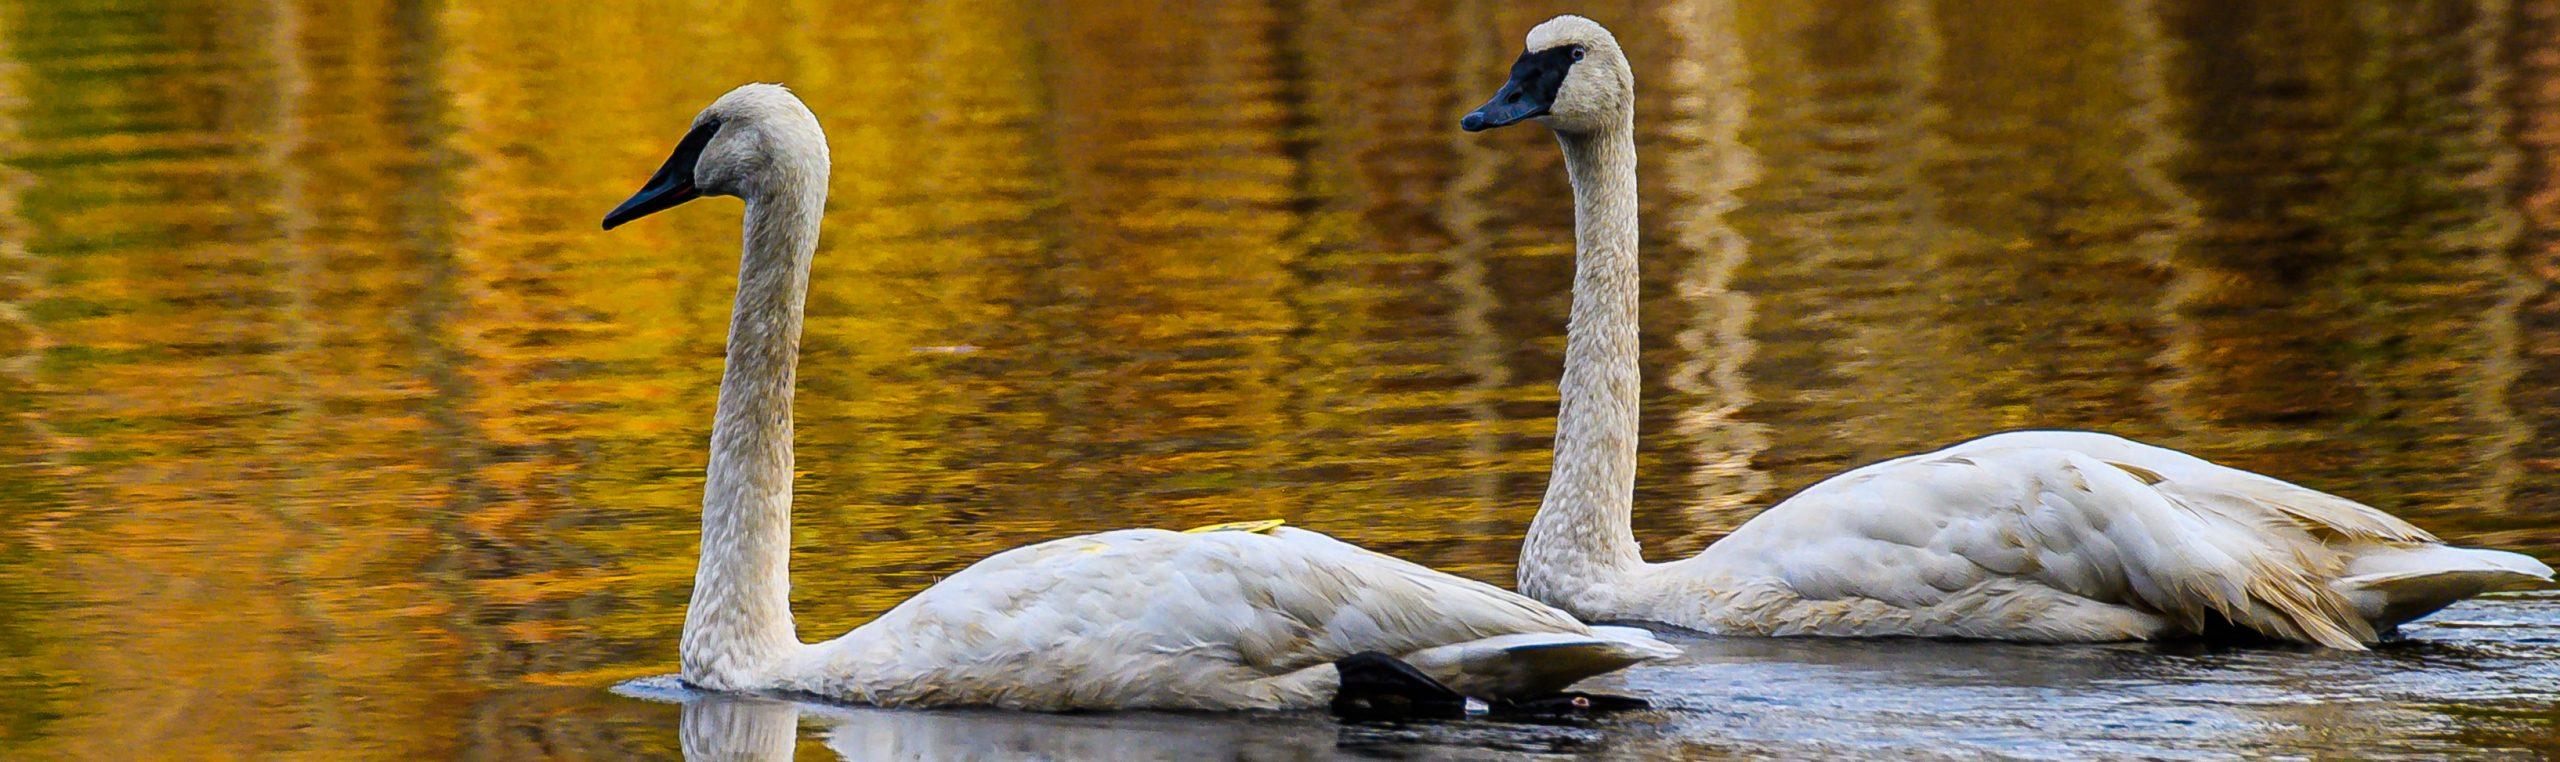 Trumpeter Swans in Muskoka